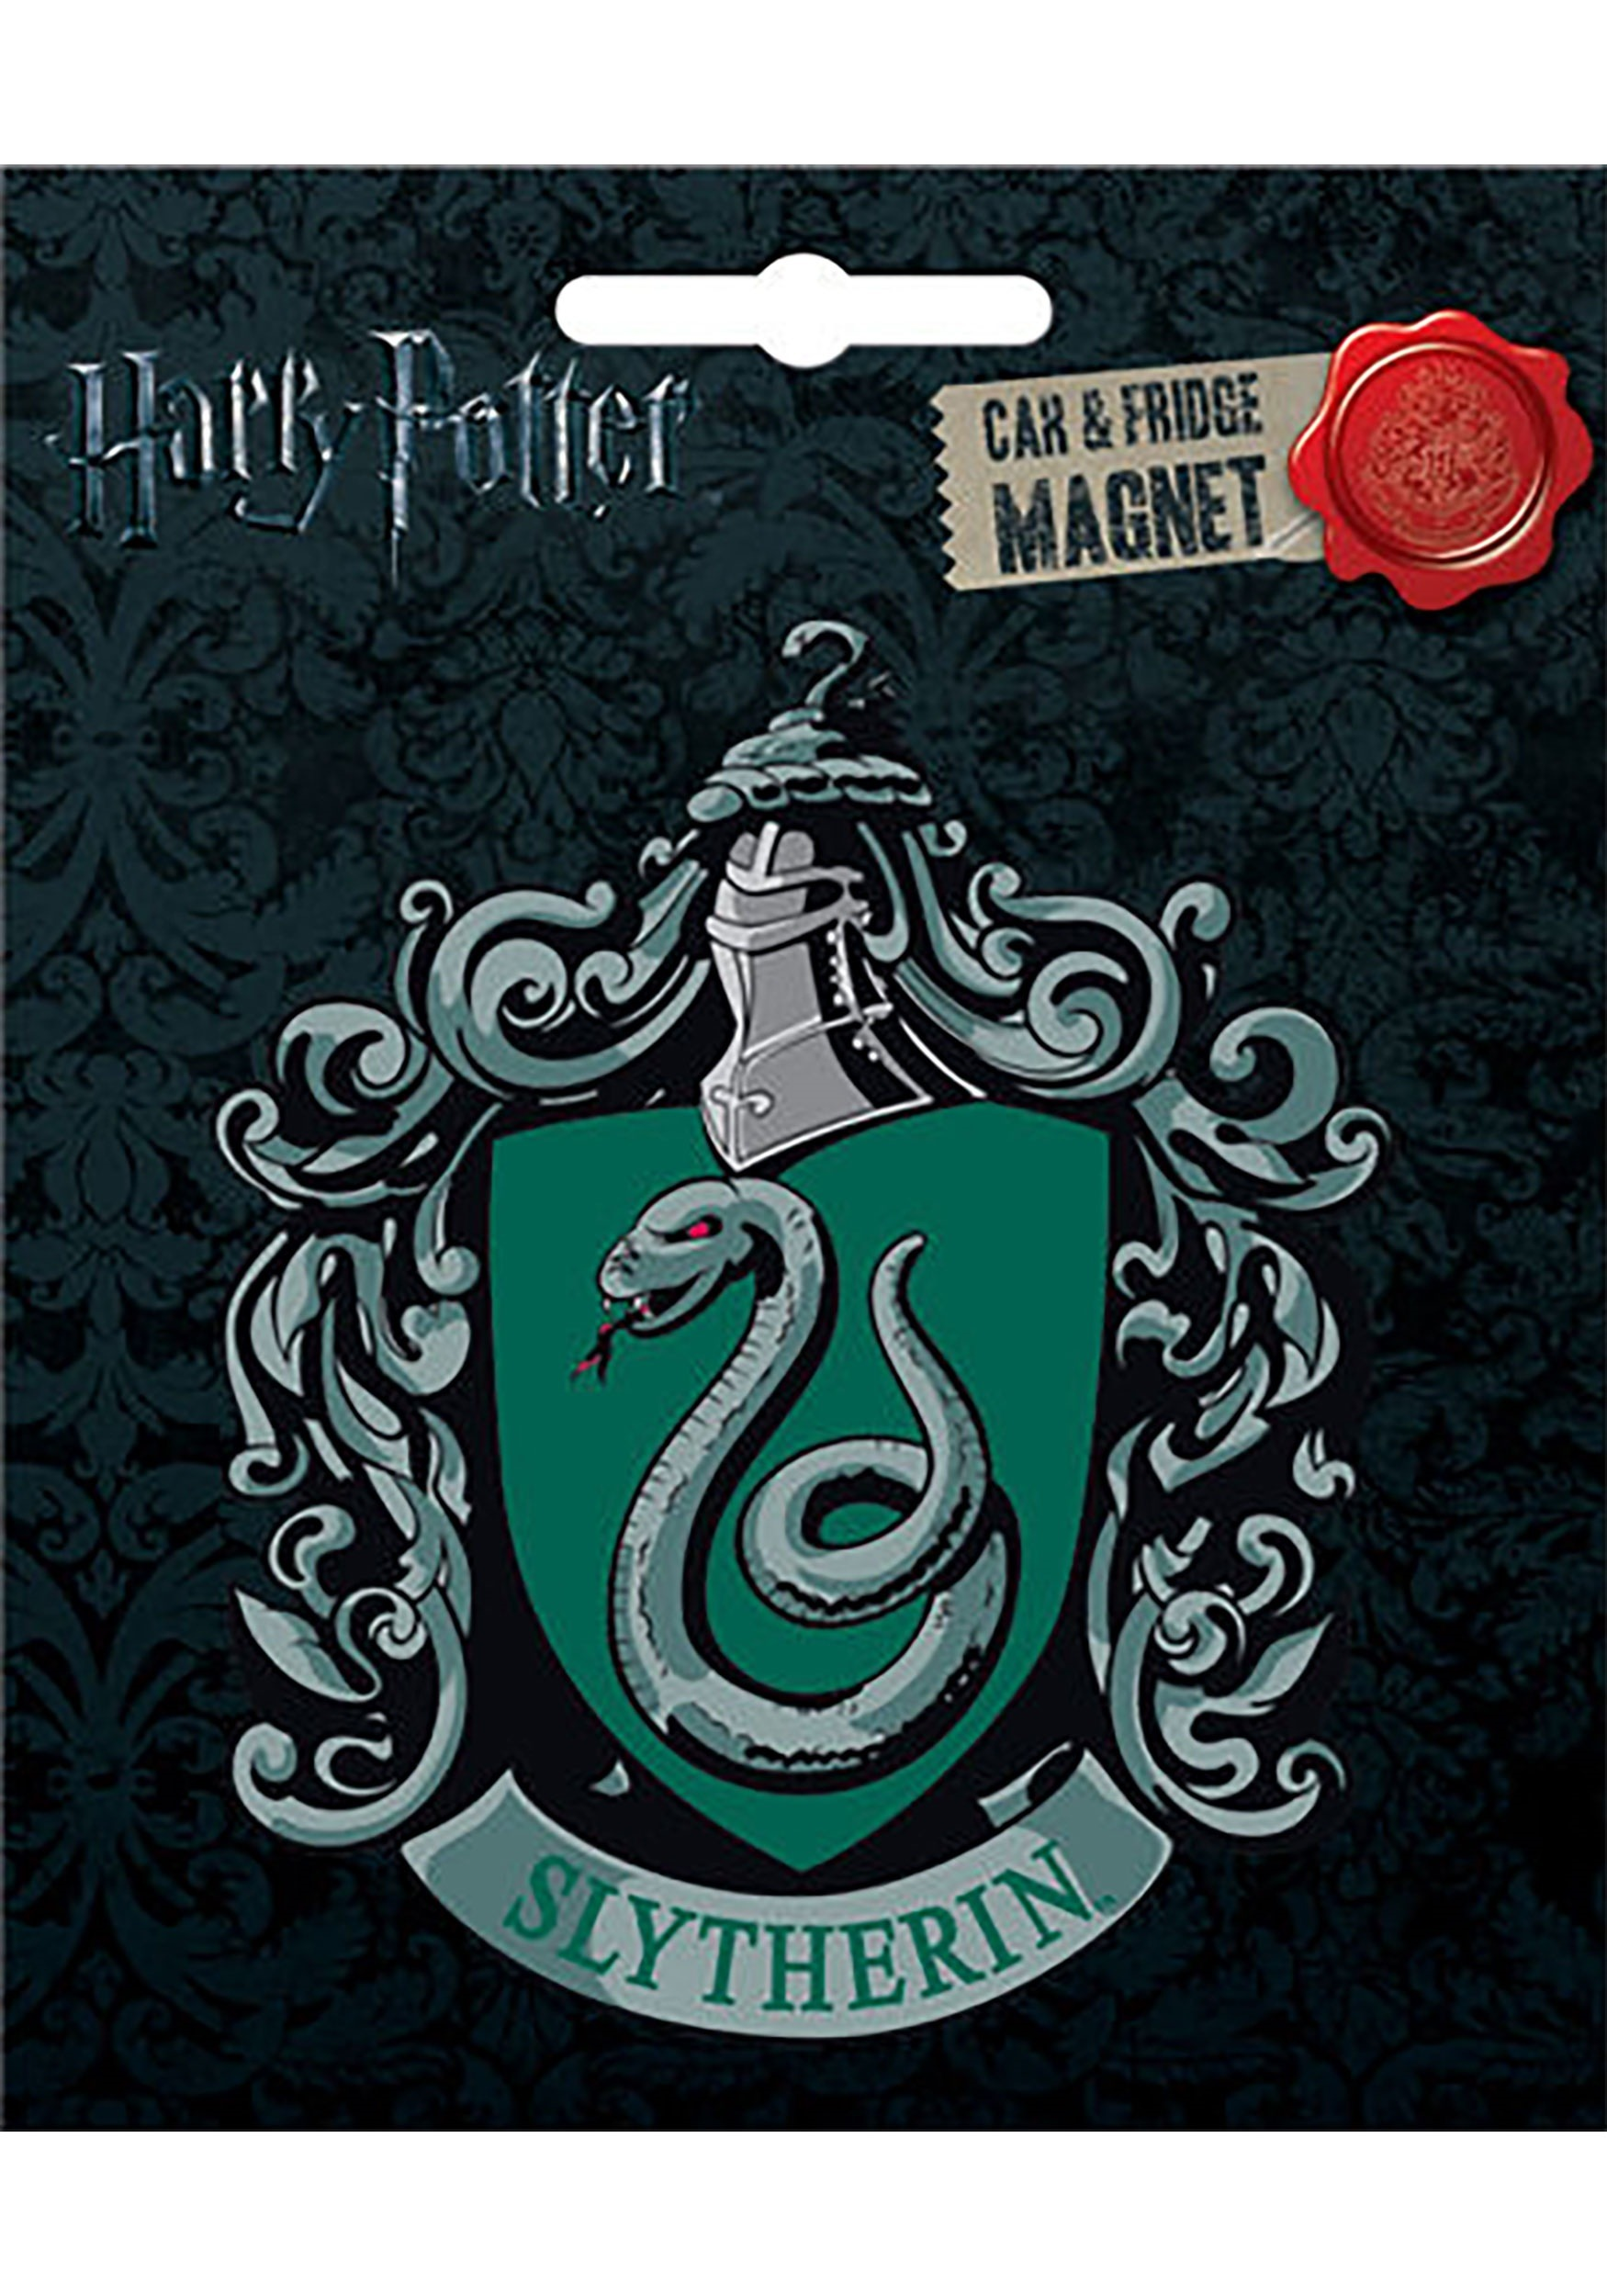 Harry_Potter_Slytherin_Car_Magnet